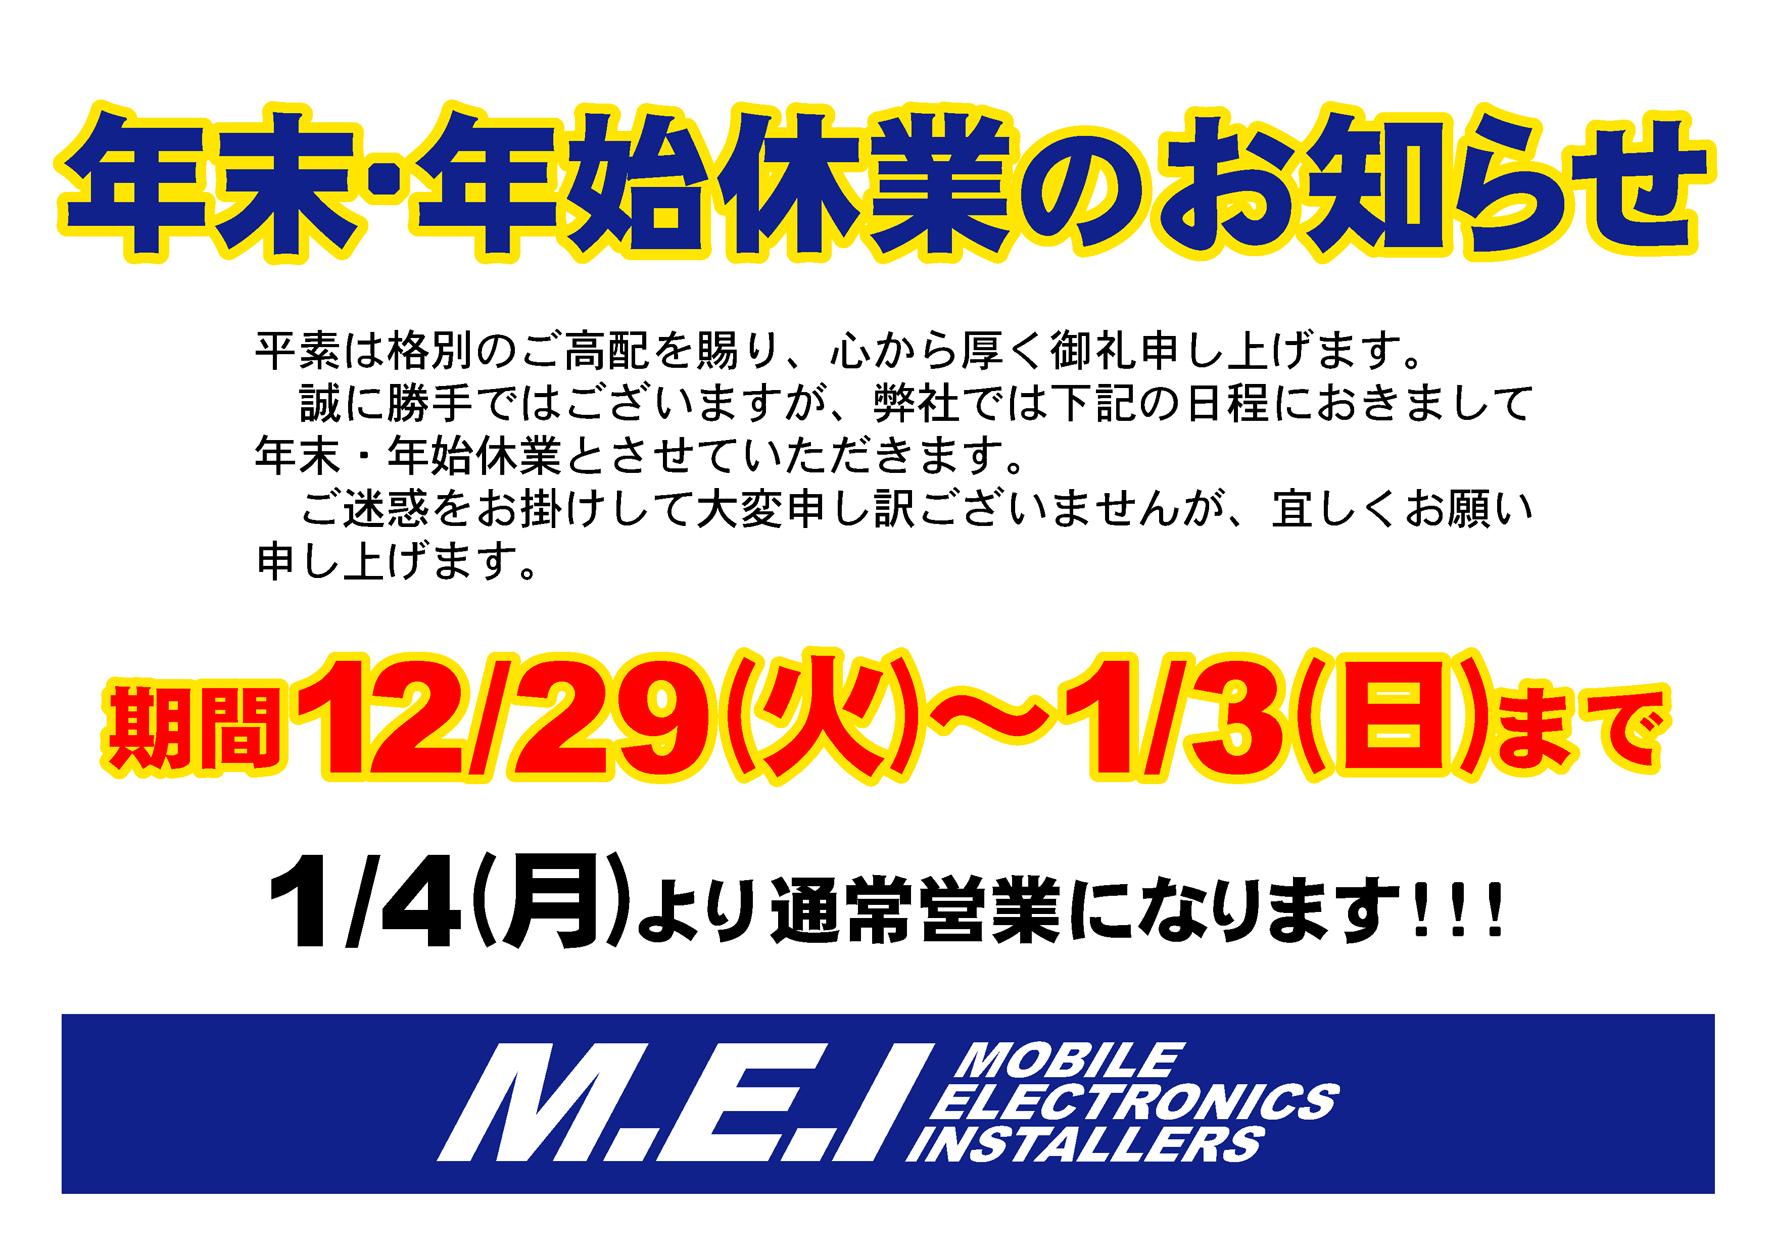 nenmatsunenshi_1.jpg